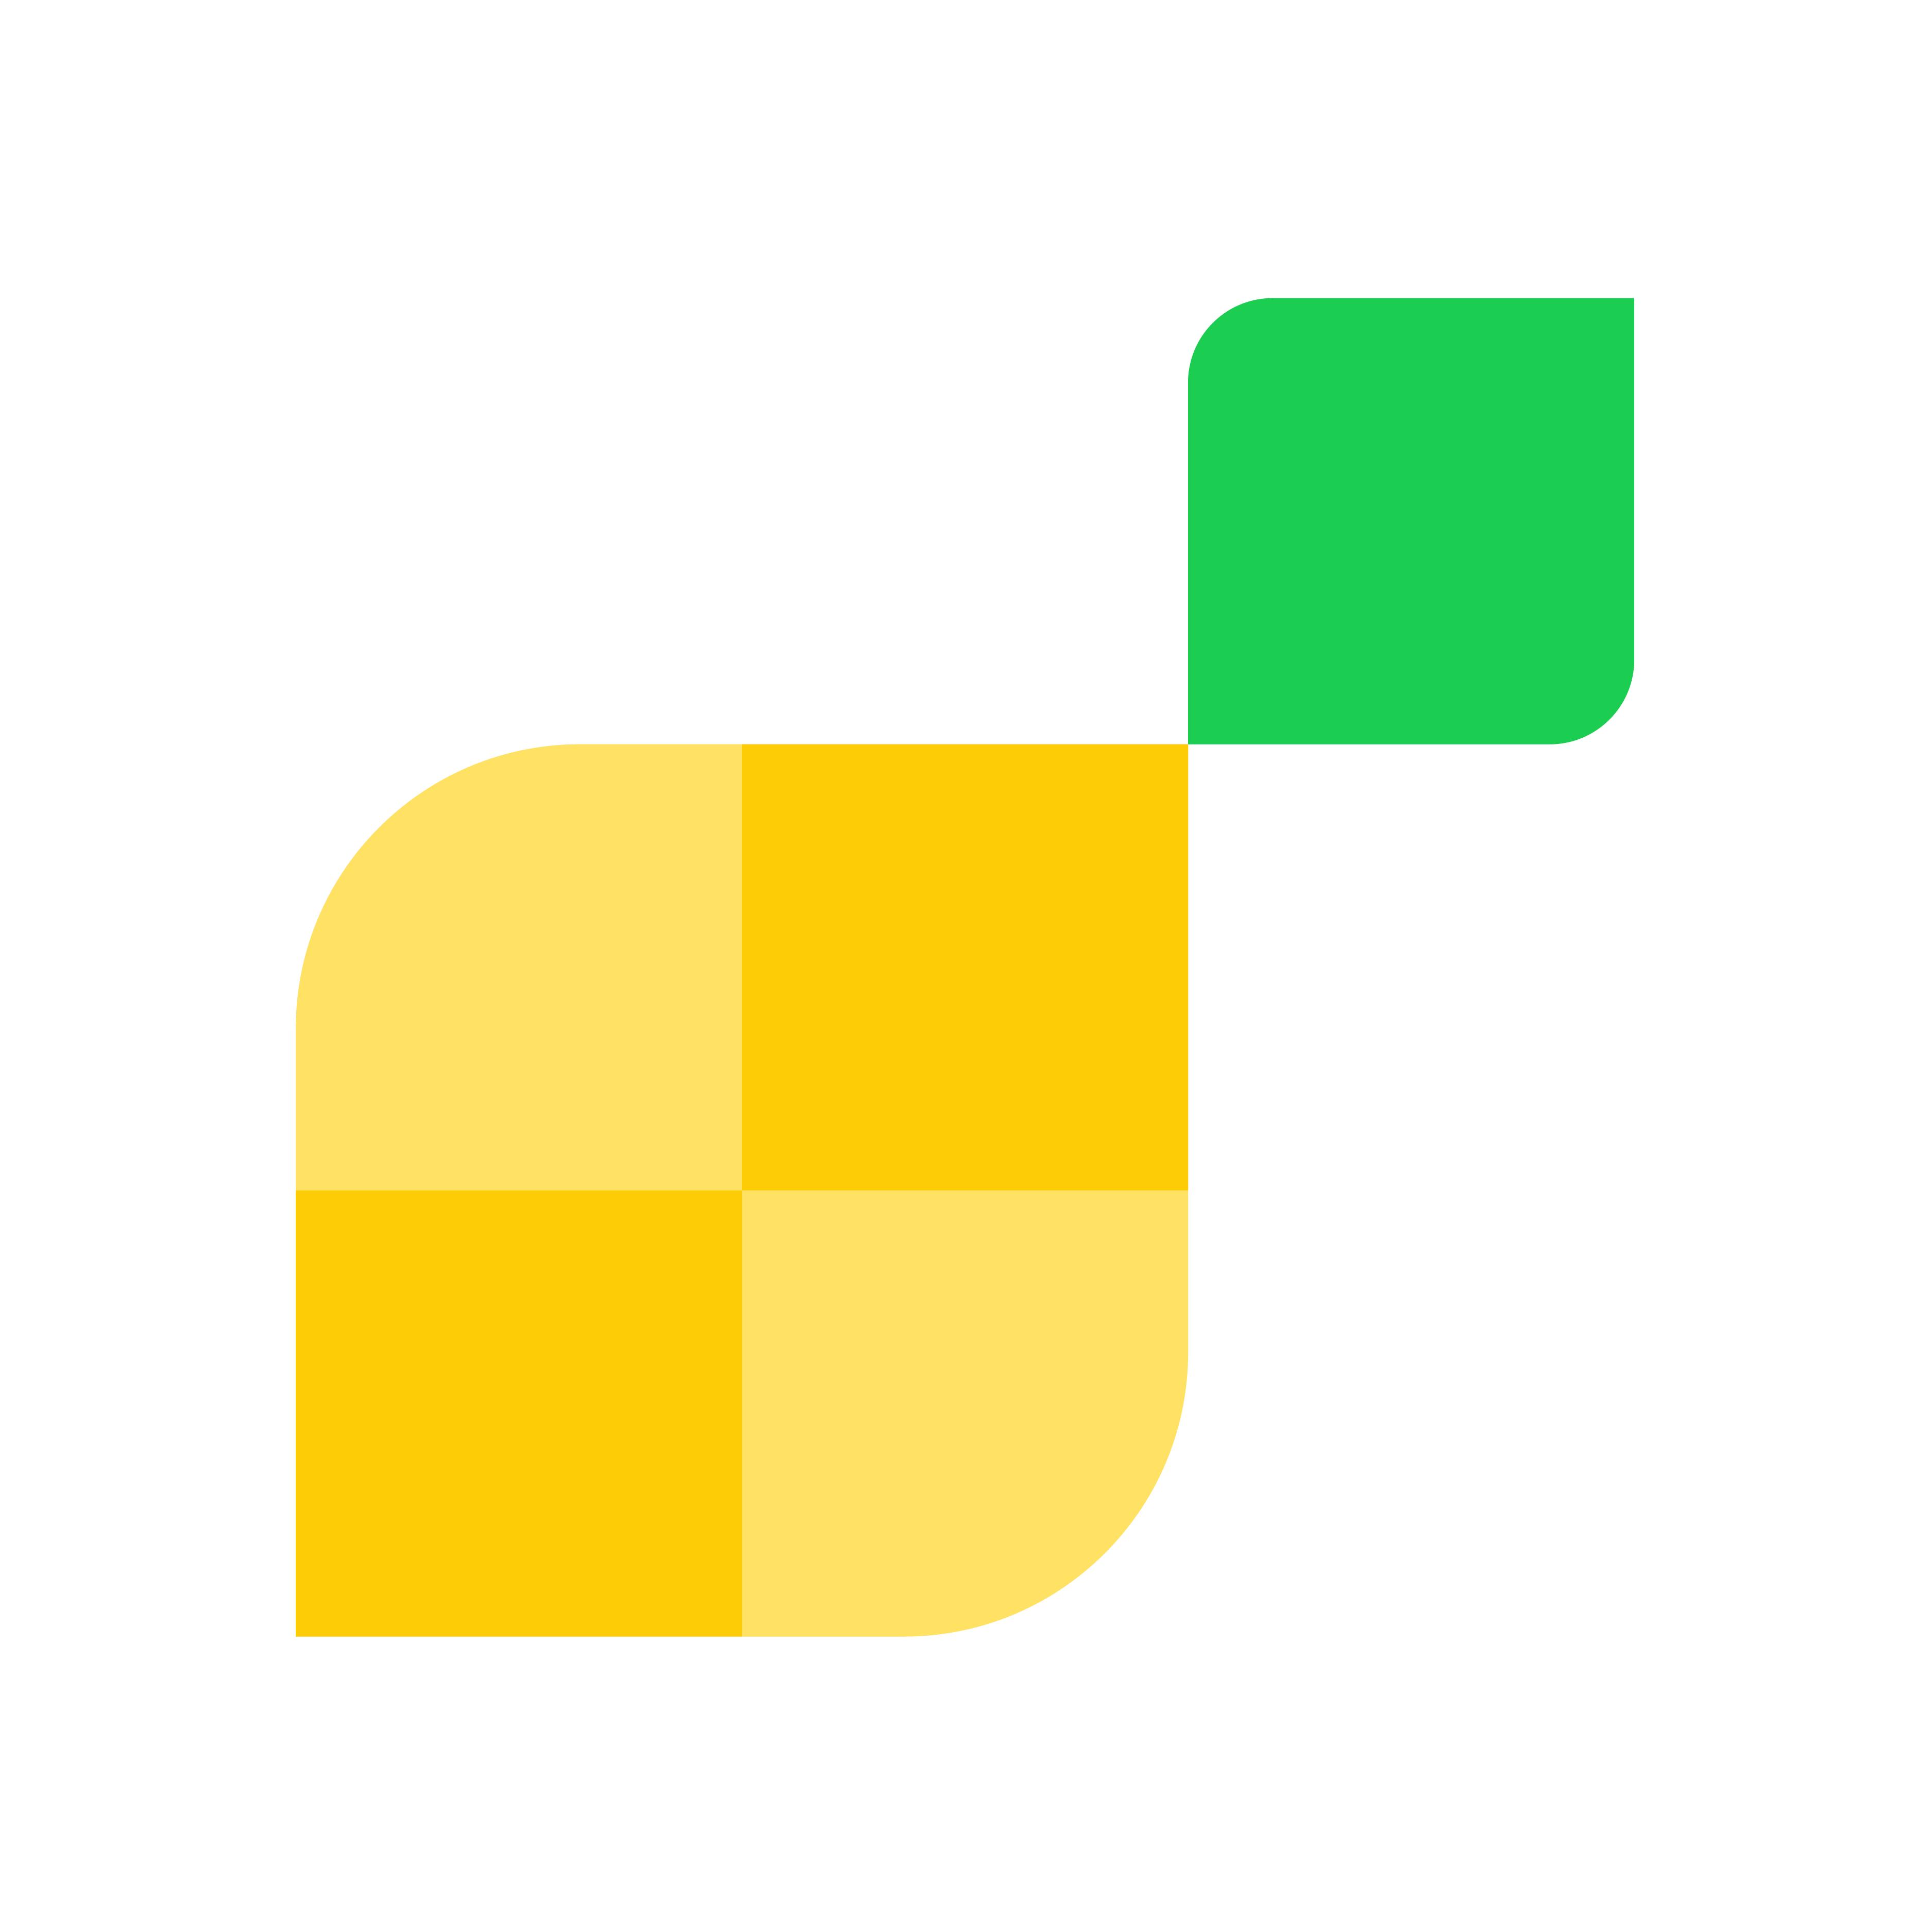 lemon data logo design by logo designer logorilla for your inspiration and for the worlds largest logo competition